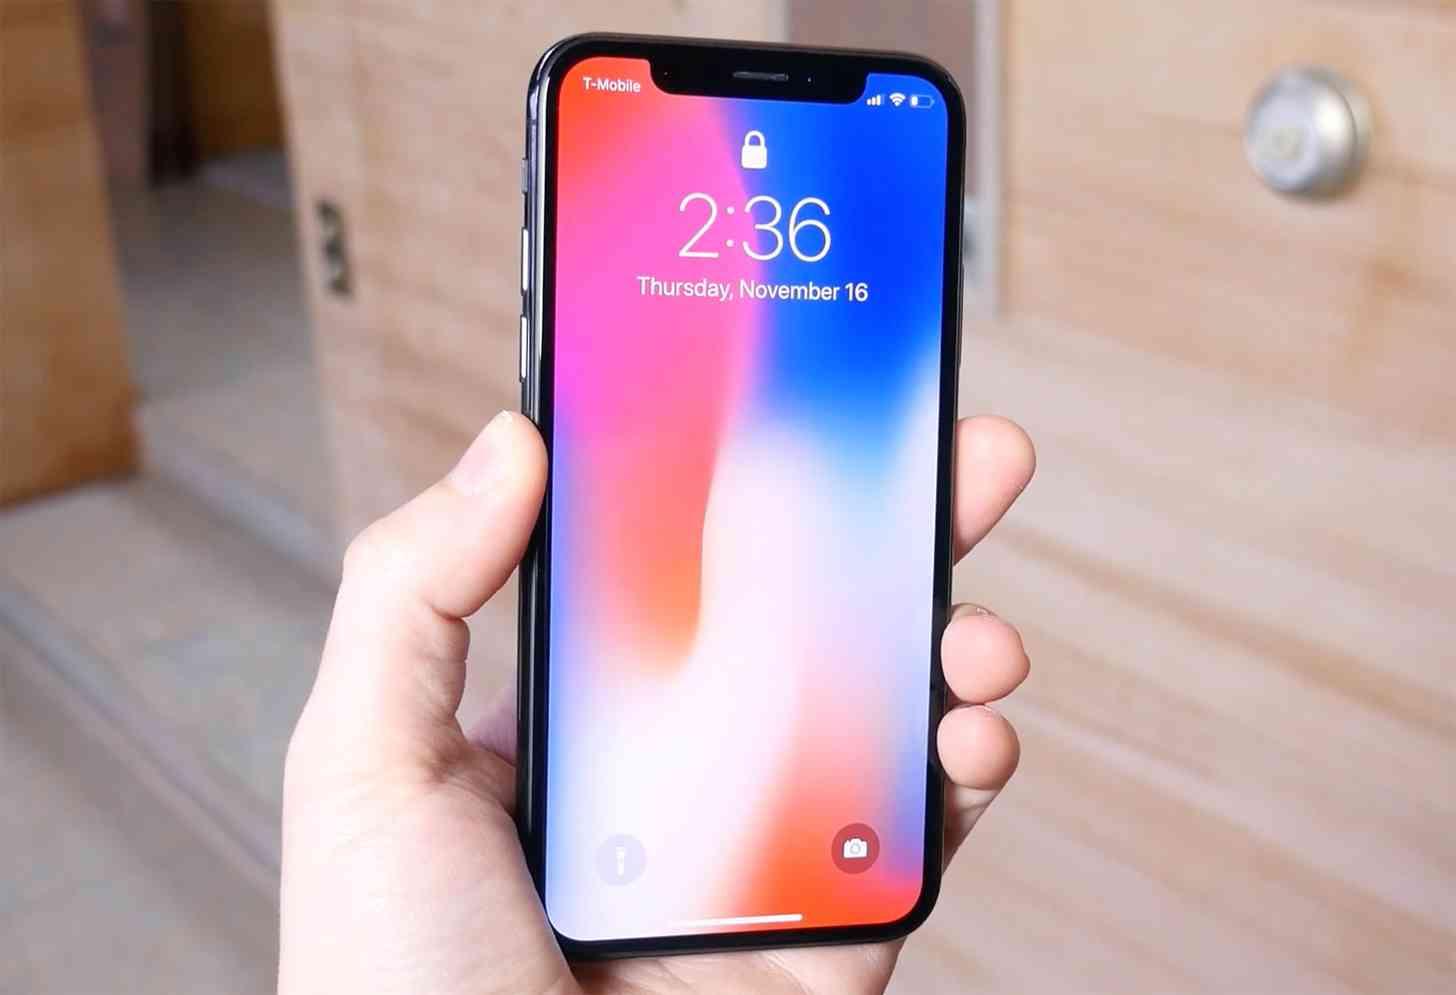 iPhone X hands-on lock screen